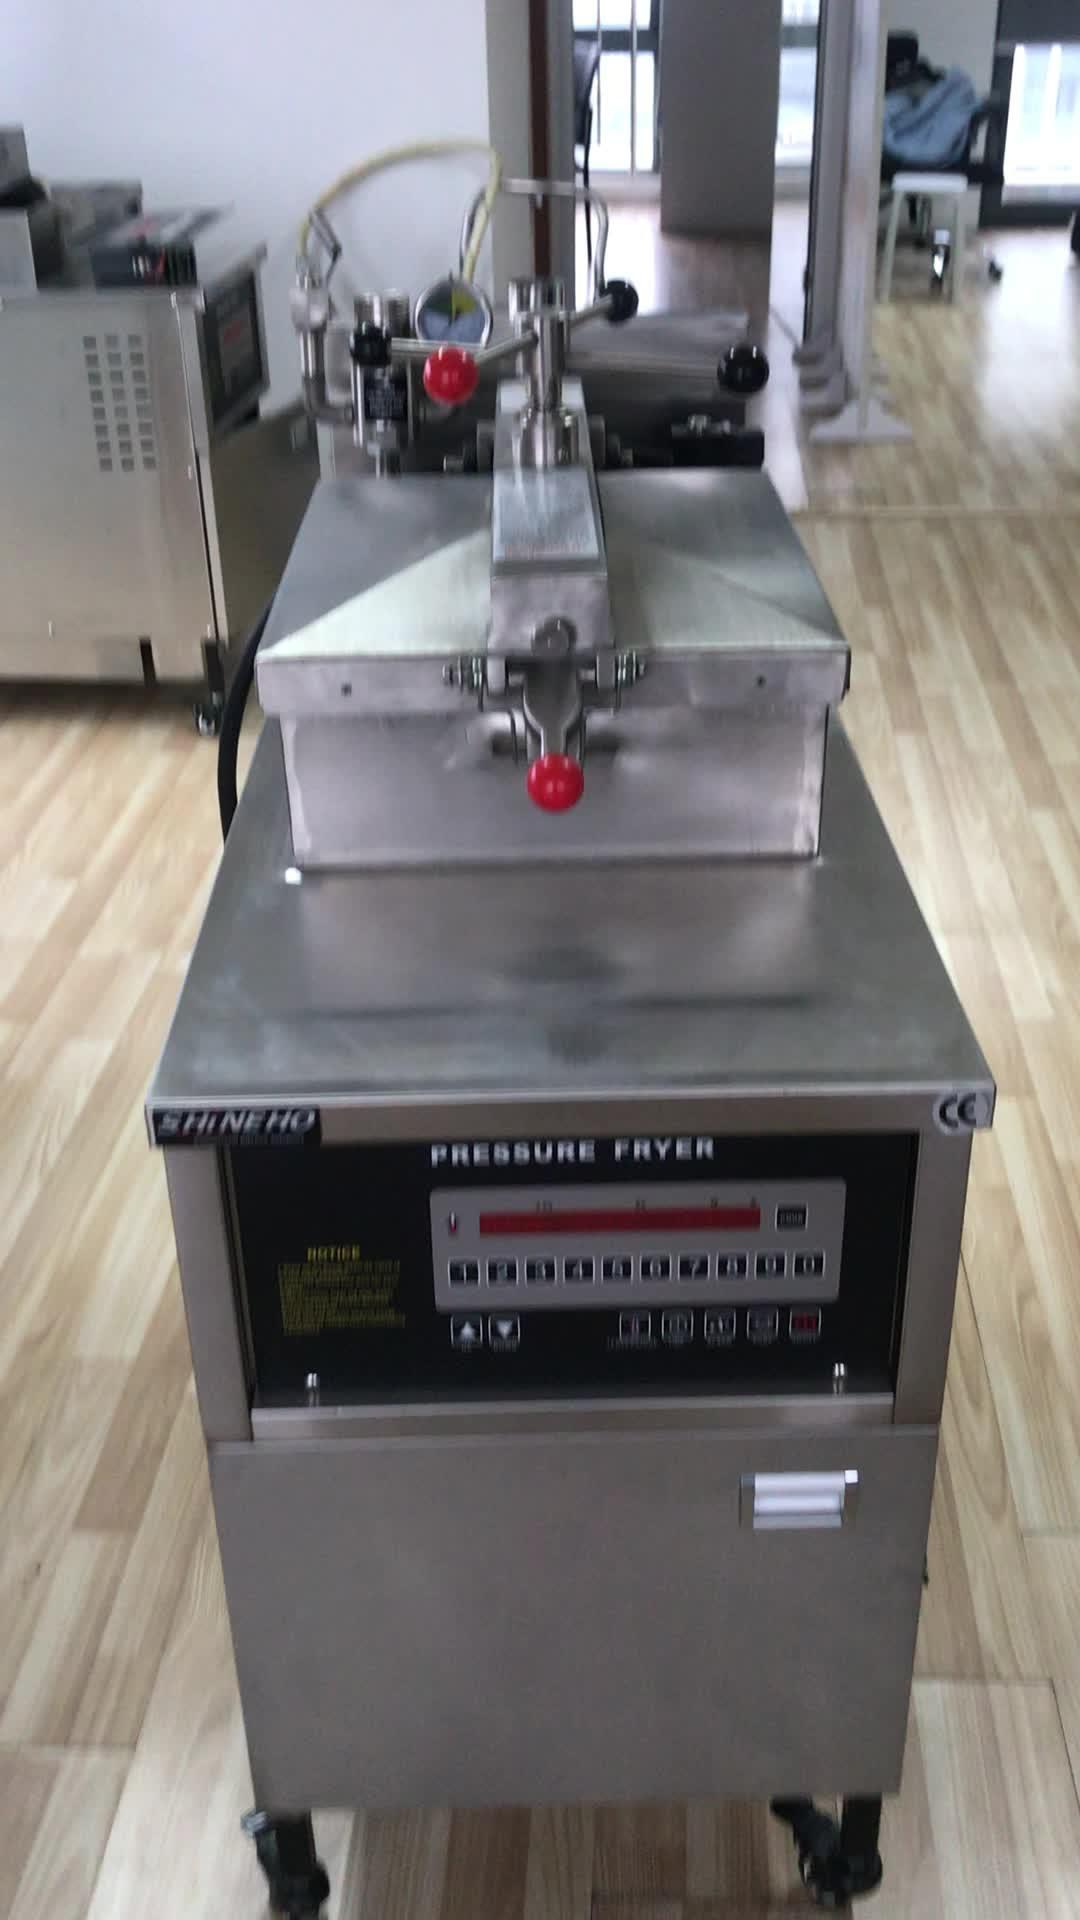 P007 Broasted Chicken Machine Henny Penny Pressure Fryer